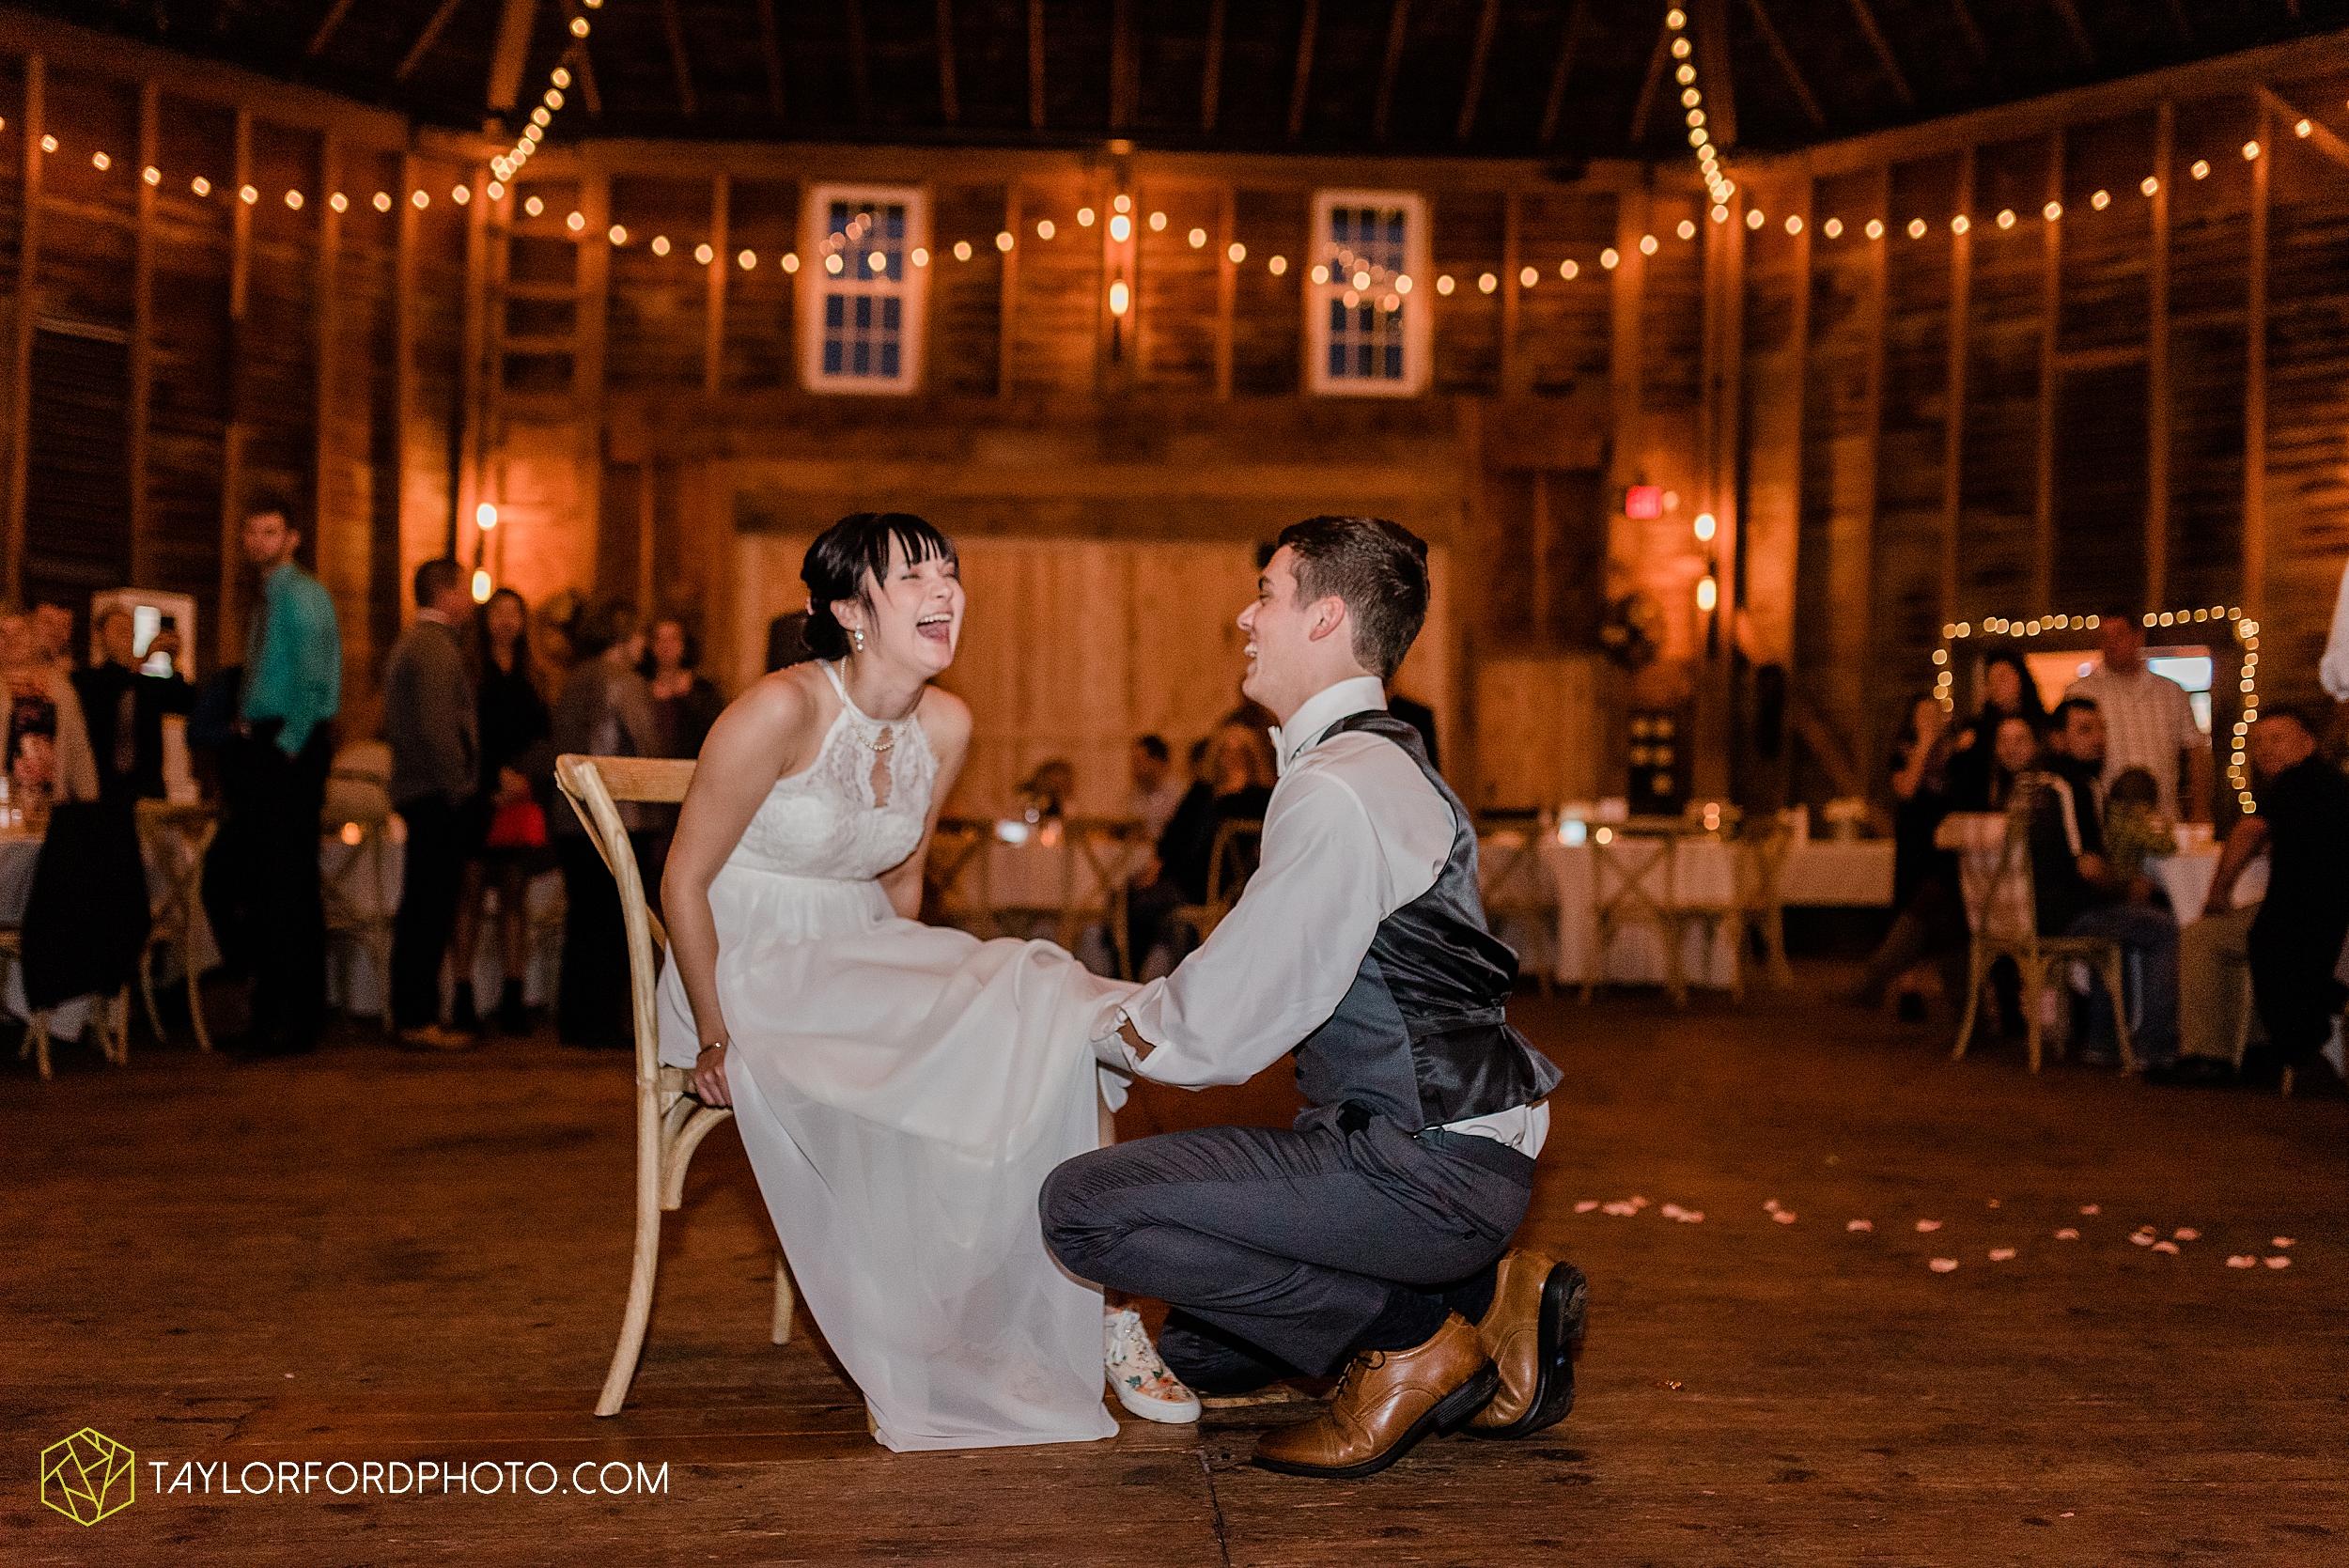 marissa-nicole-nick-daeger-orrmont-estate-farm-wedding-piqua-dayton-troy-ohio-fall-photographer-taylor-ford-photography_1567.jpg